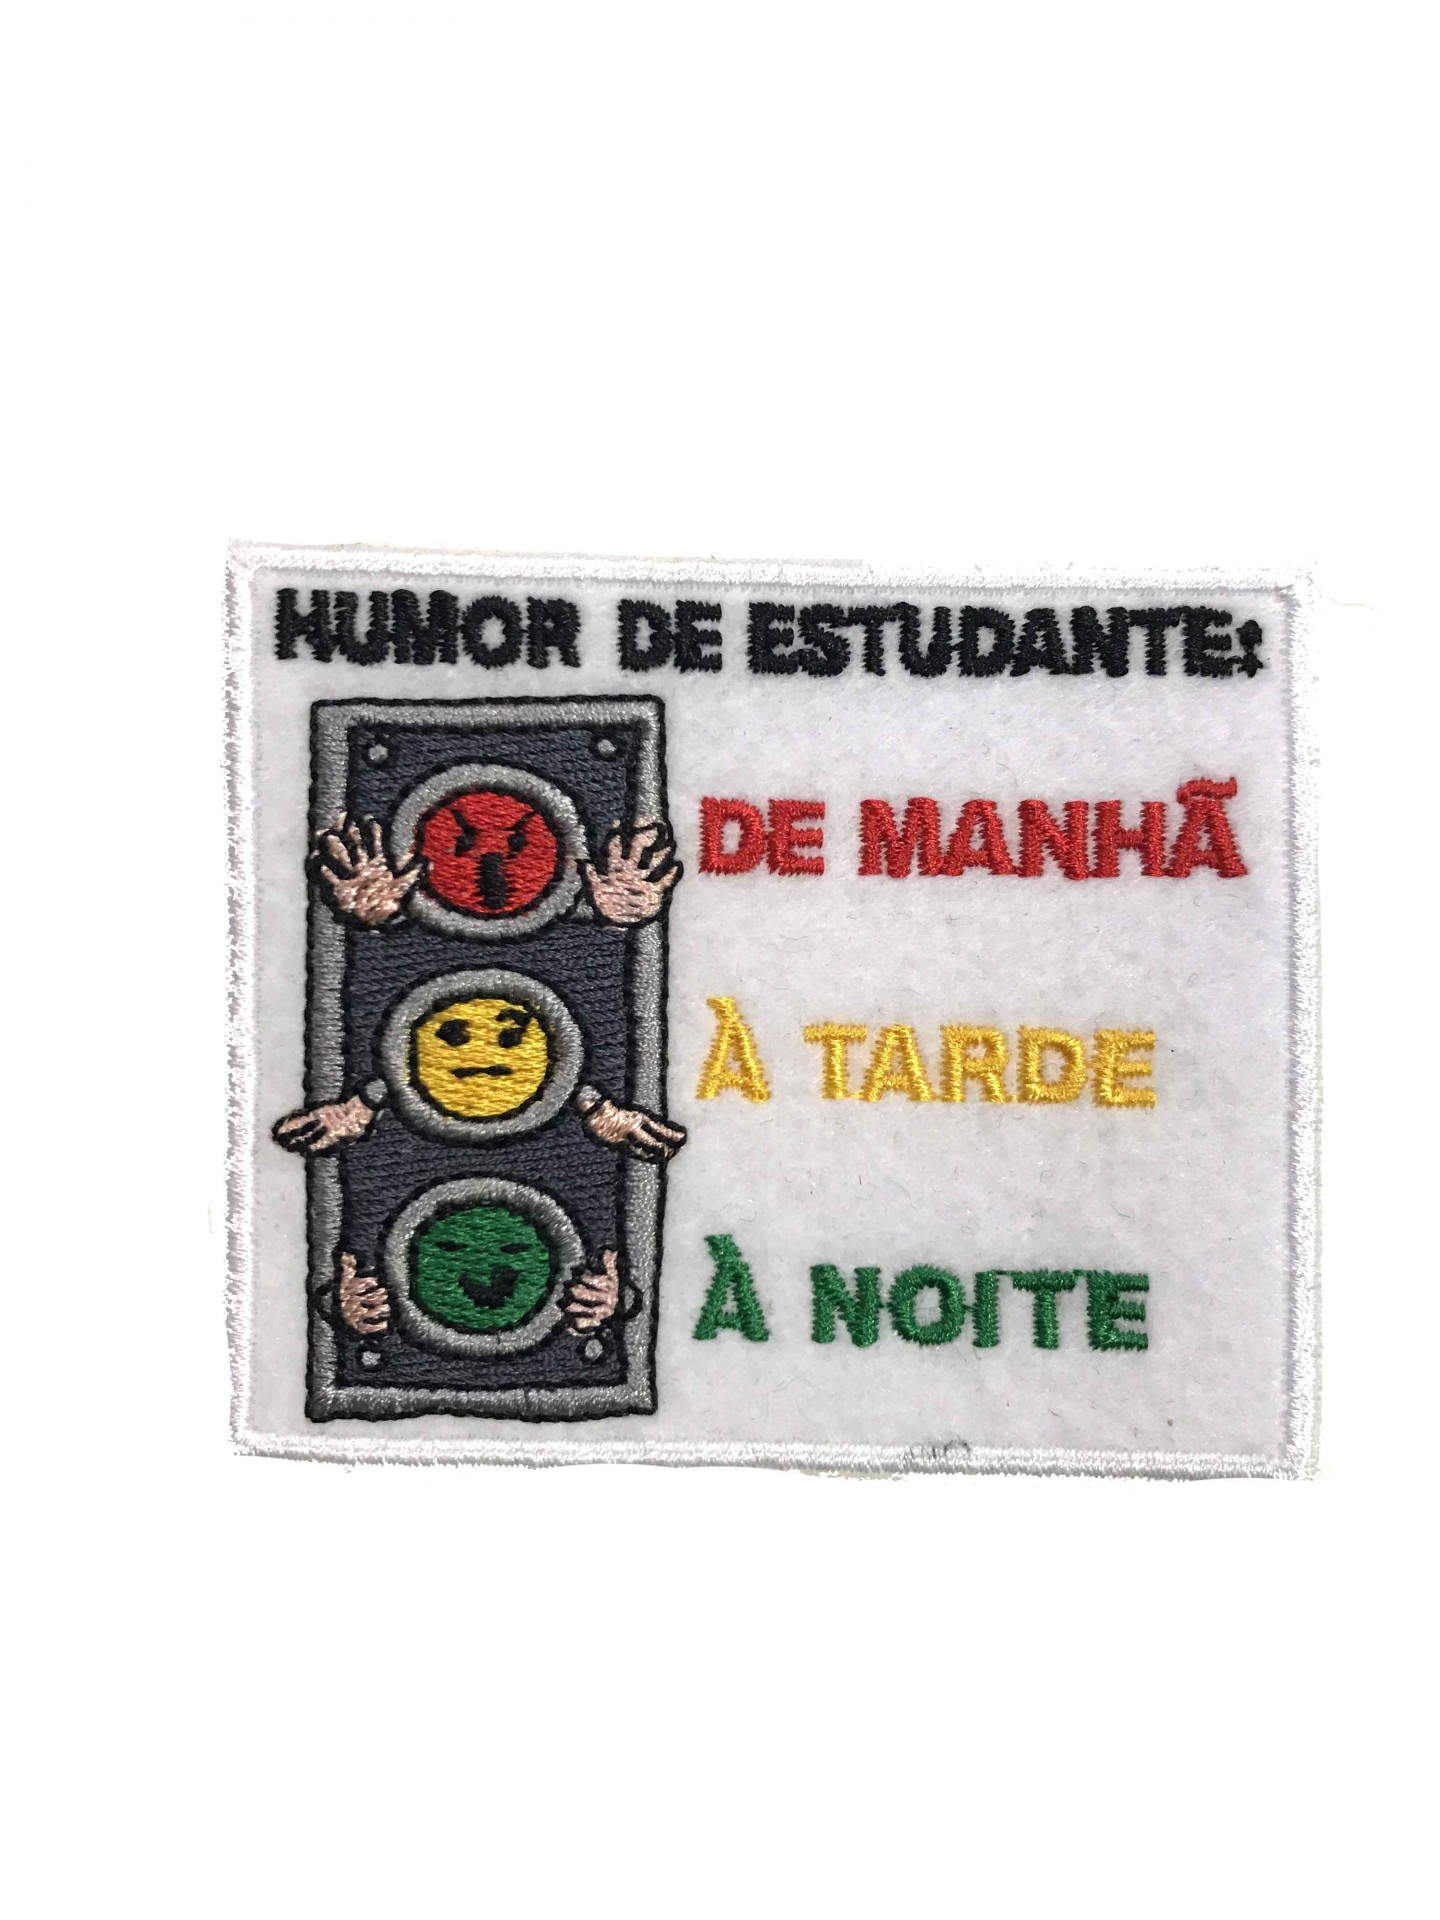 Emblema Humor de Estudante